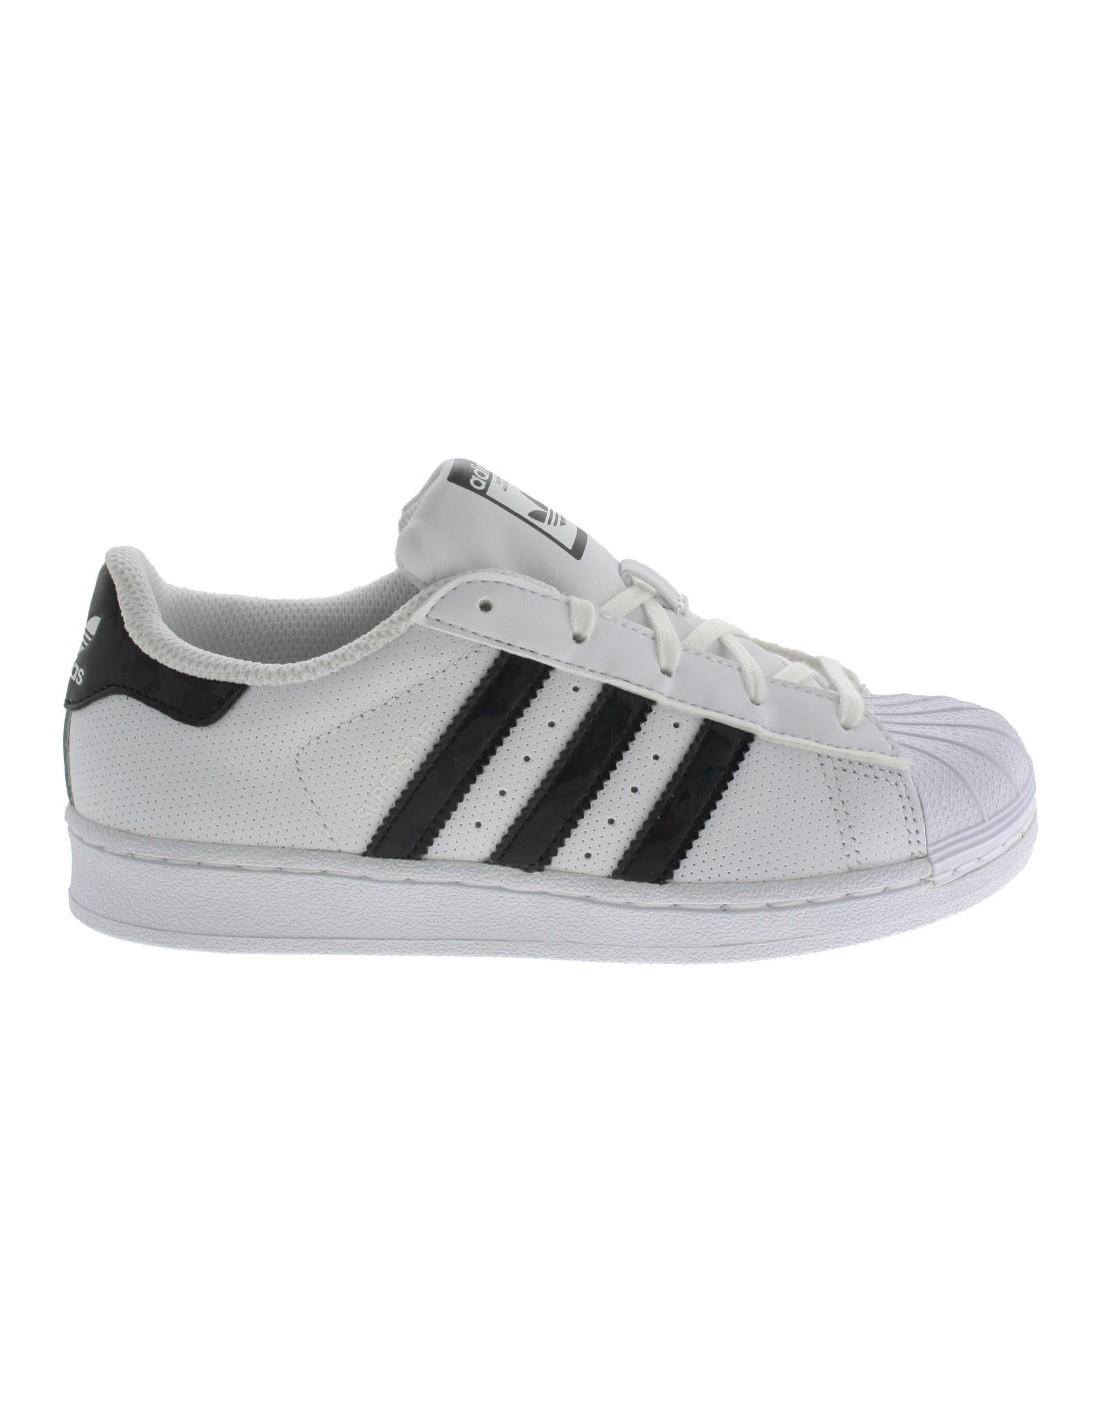 Bianco Scarpe Superstar Adidas Nero E C Bambino qxgvwzZ